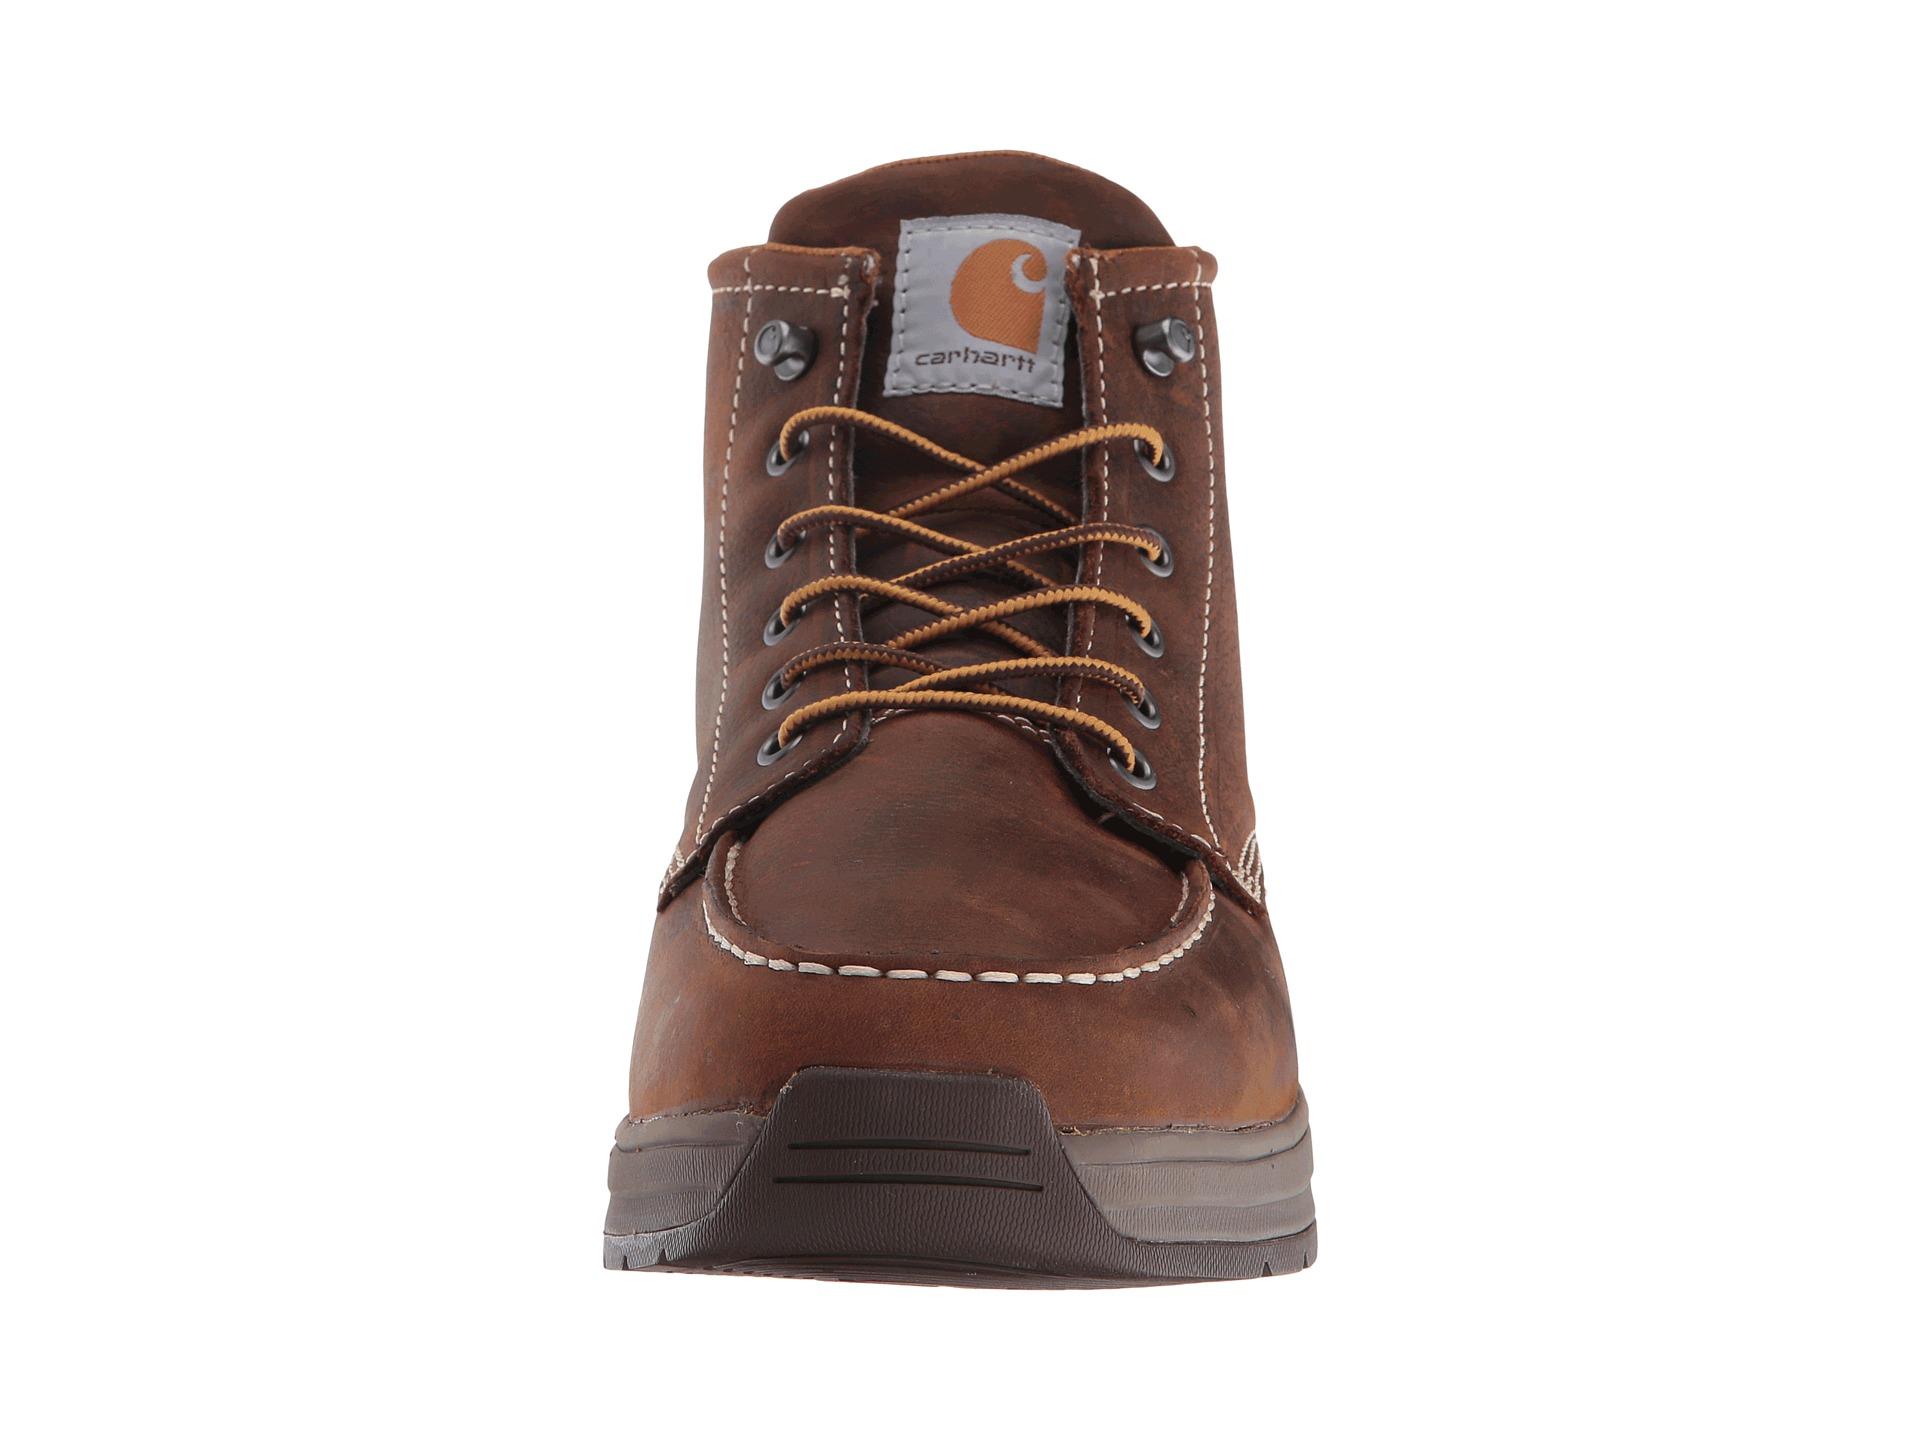 carhartt 4 quot lightweight wedge boot at zappos